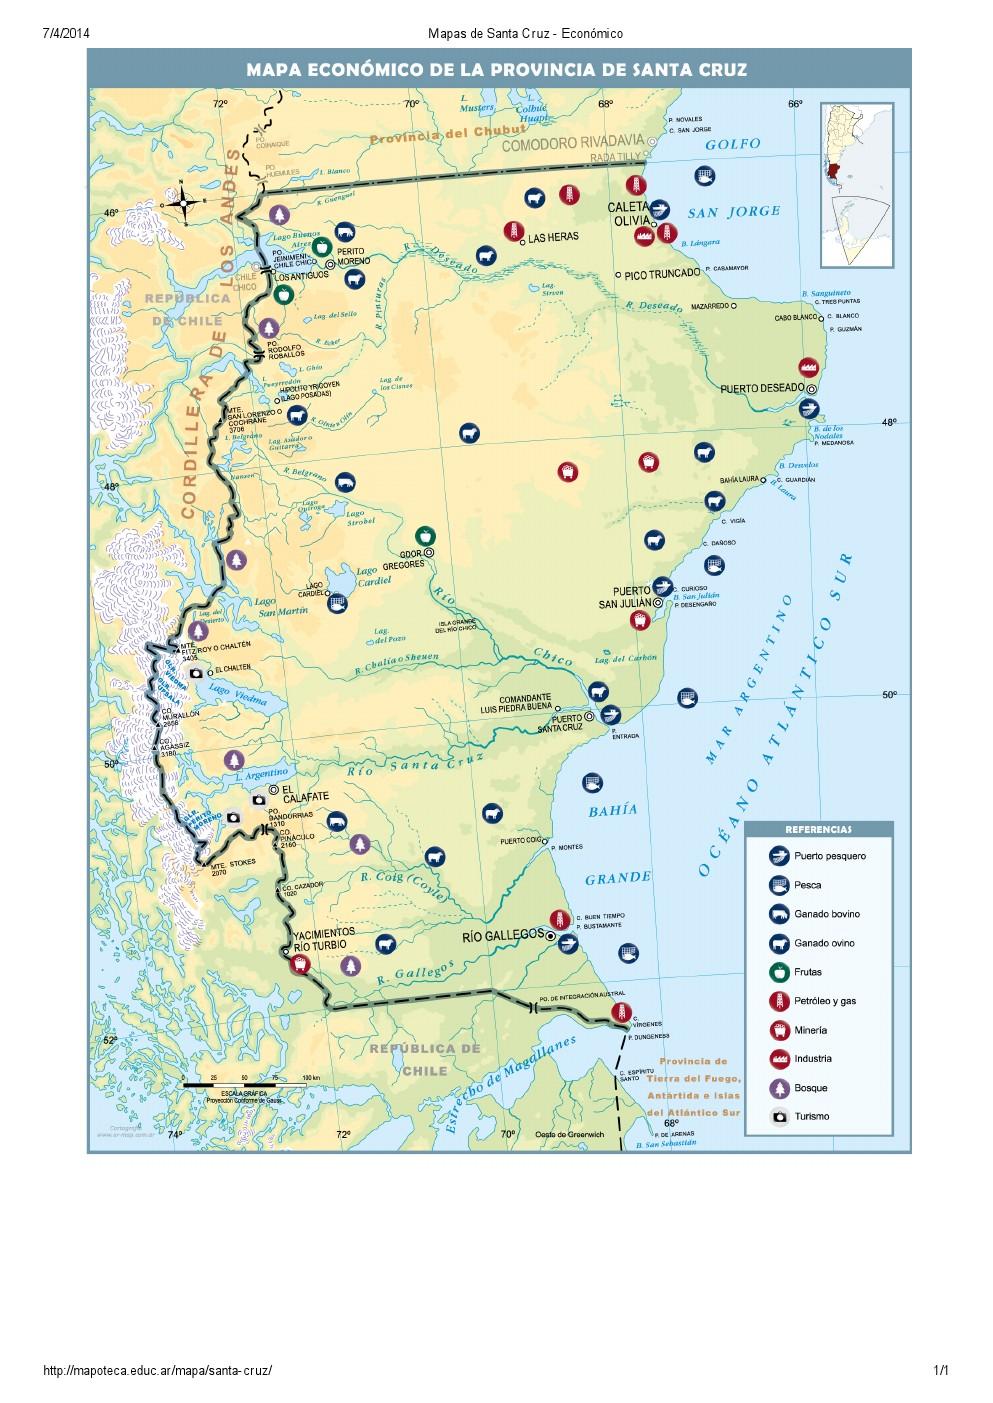 Mapa económico de Santa Cruz. Mapoteca de Educ.ar